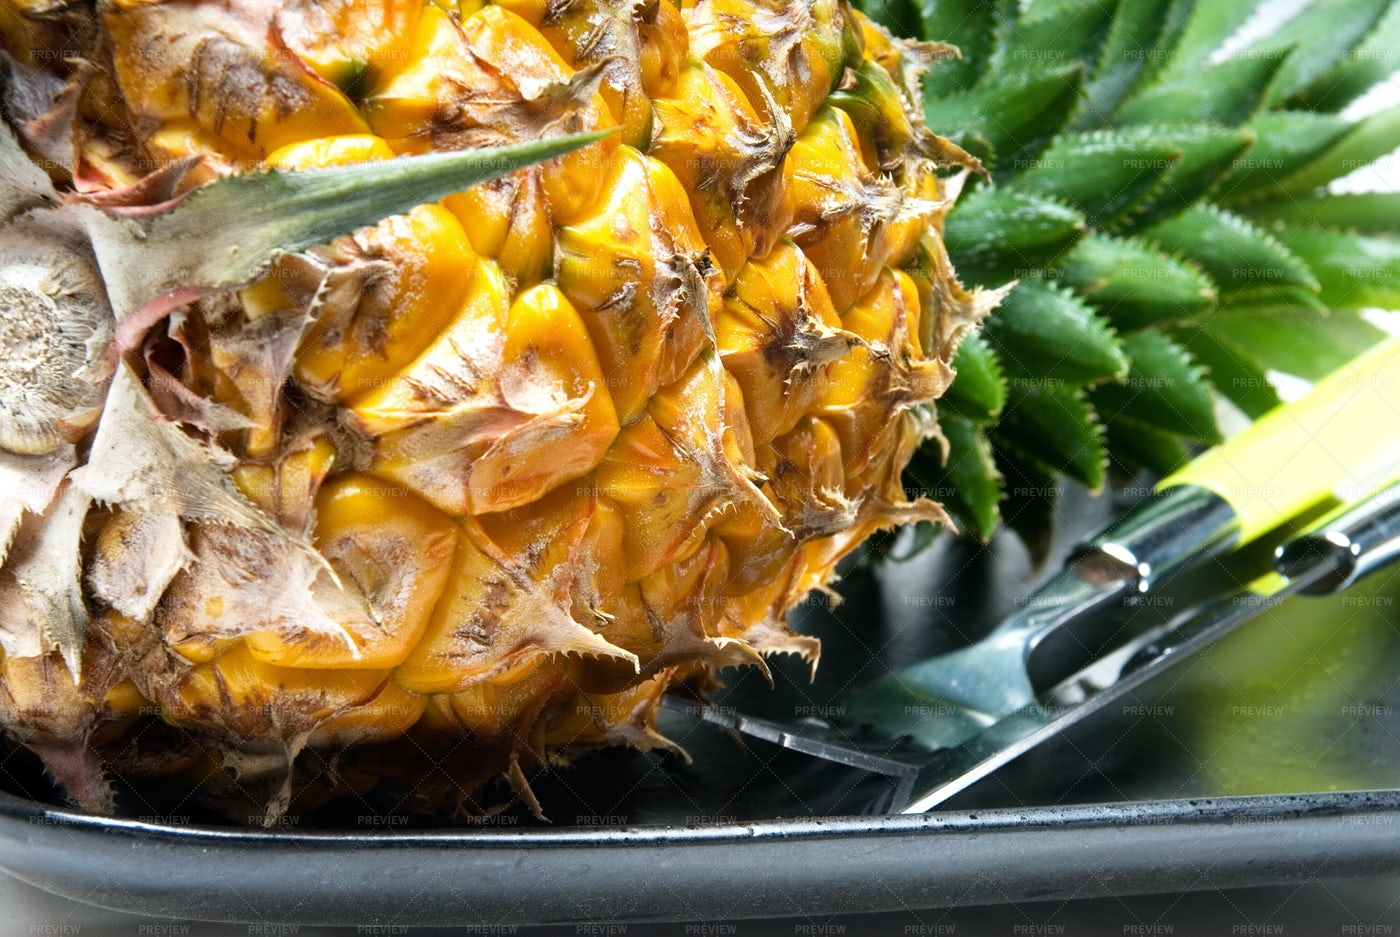 Pineapple: Stock Photos